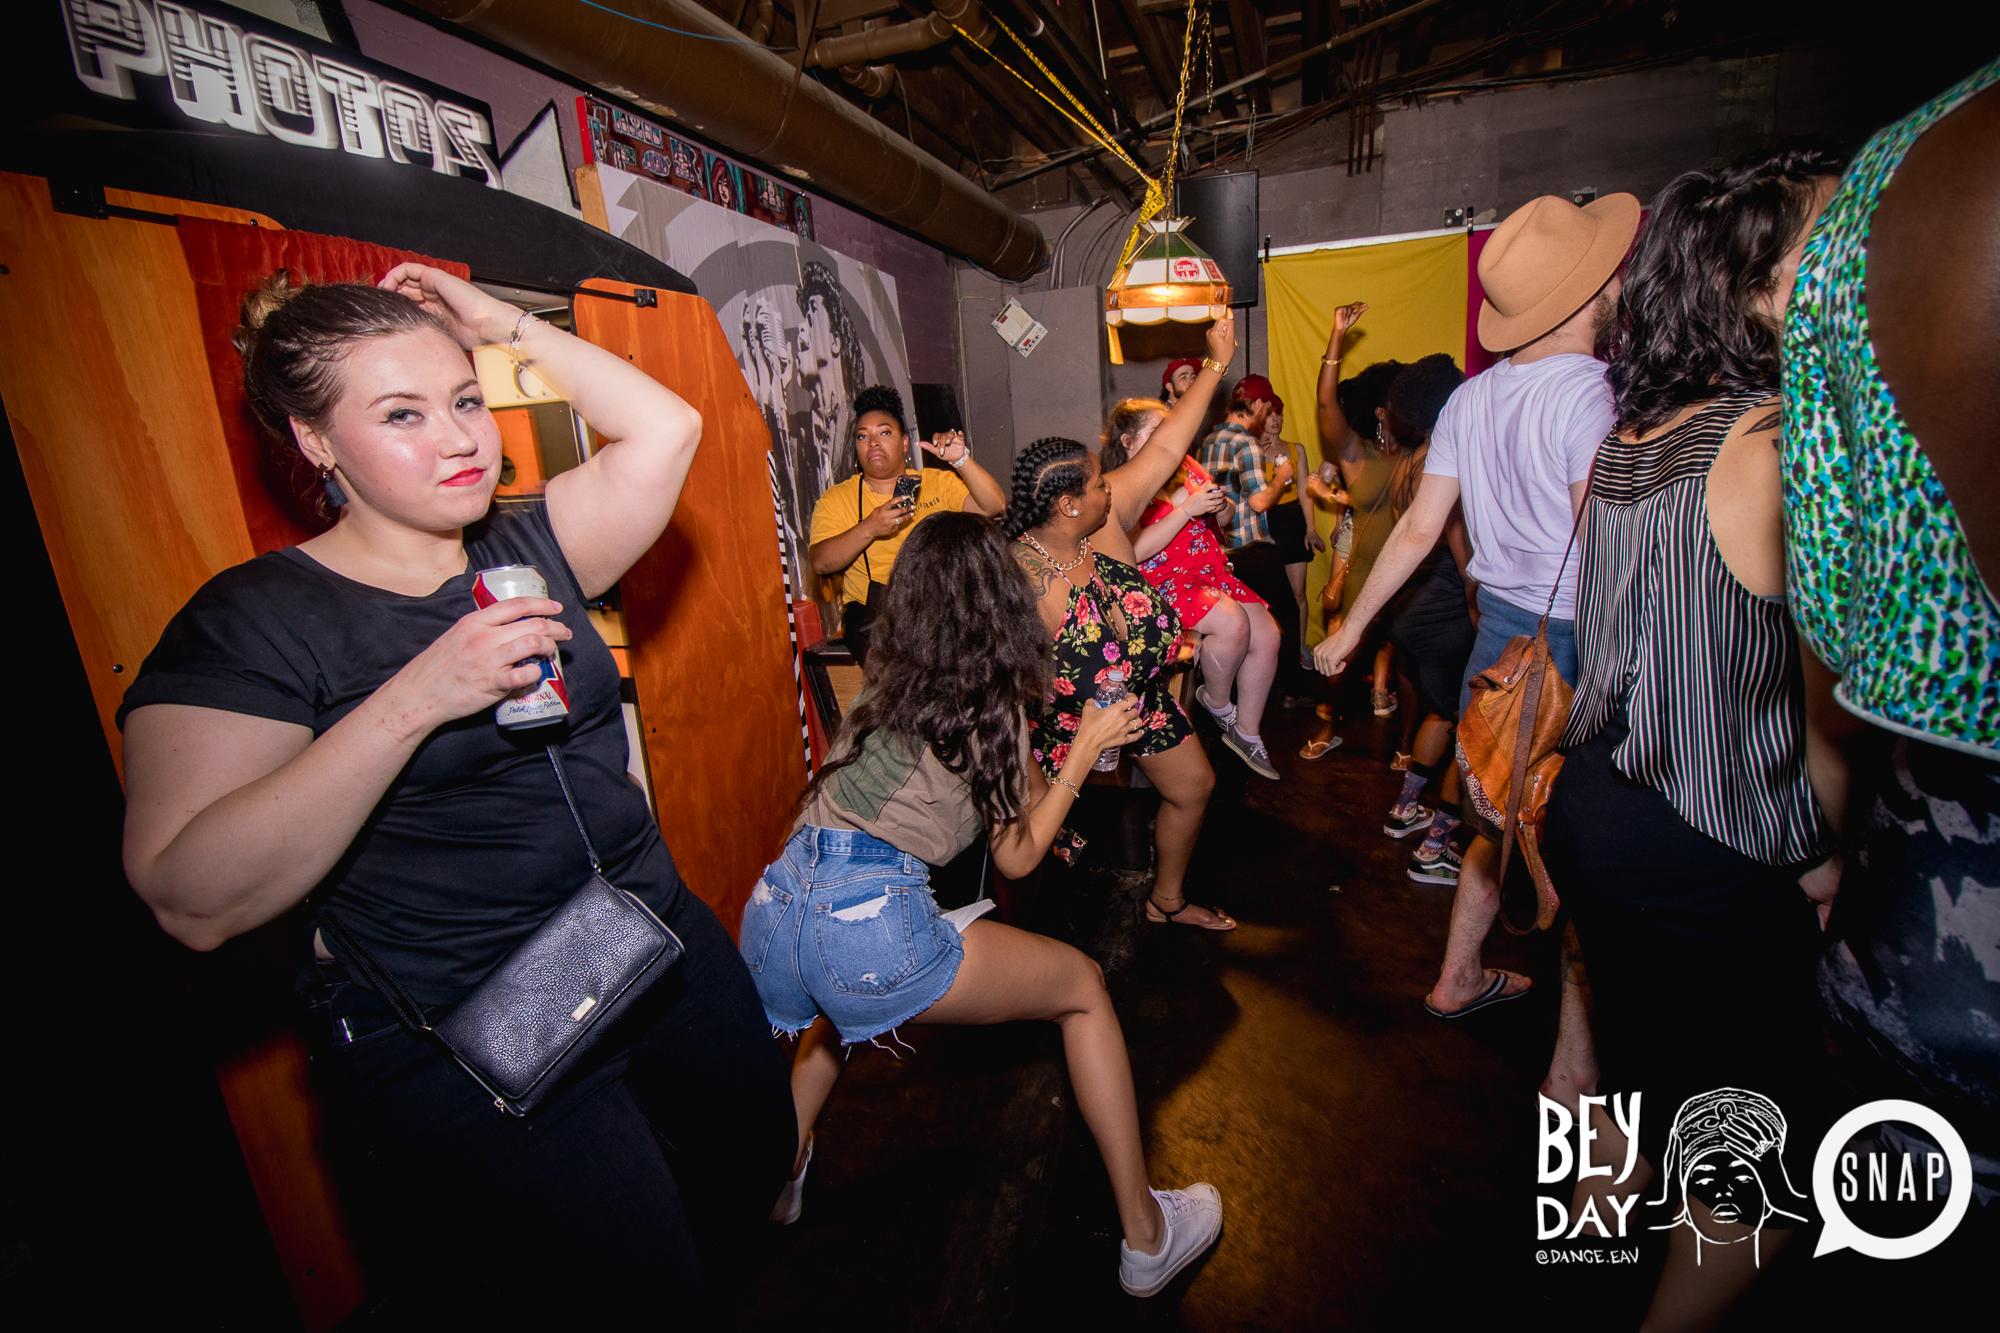 106Bey Day Grace Kelly The Basement Atlanta Oh Snap Kid.jpg